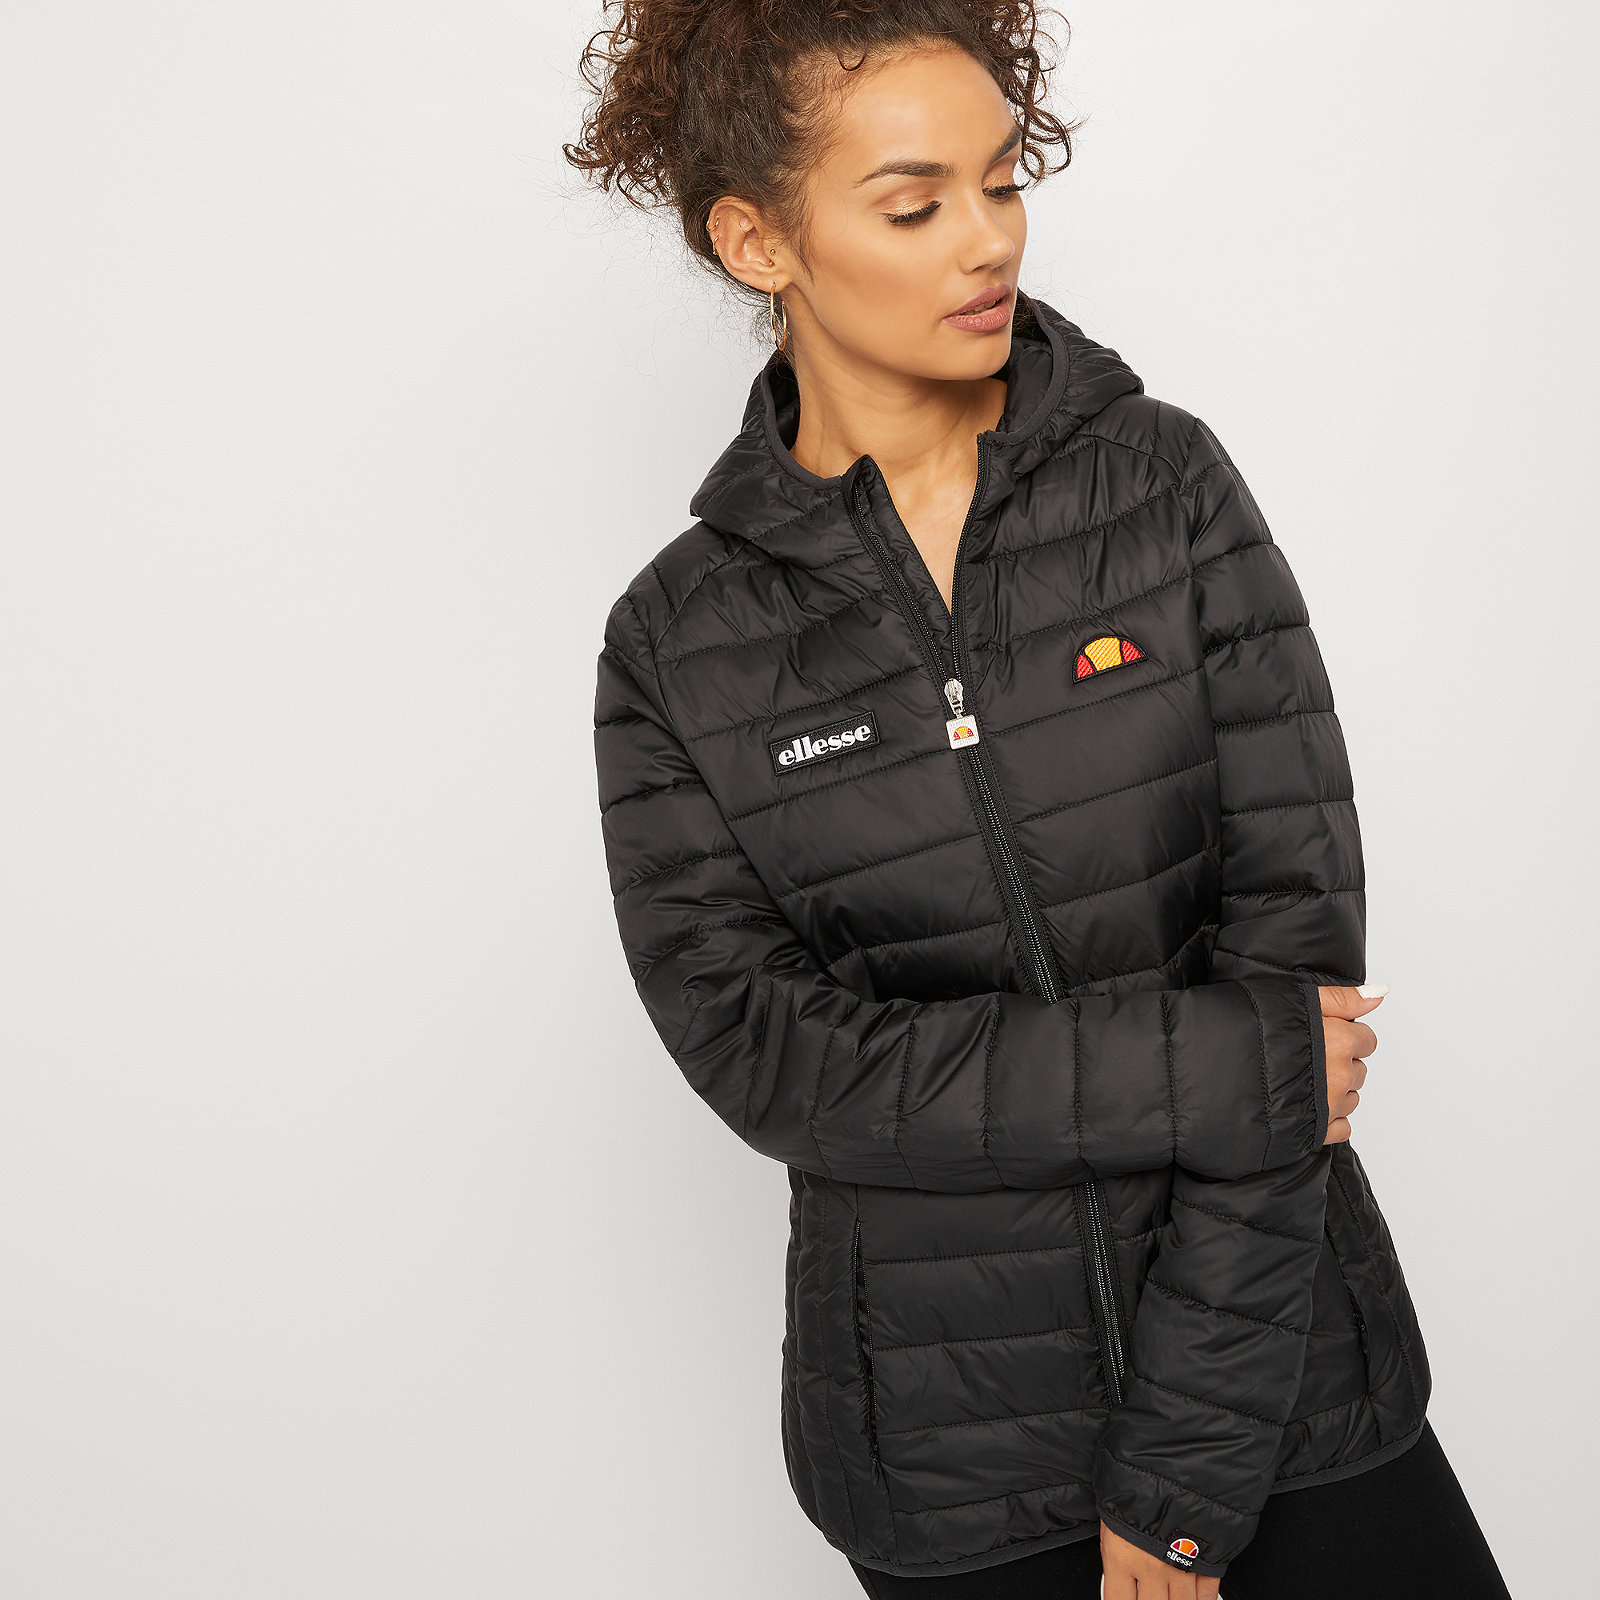 ELLESSE Ellesse Lompard Full Zip Jacket anthracite